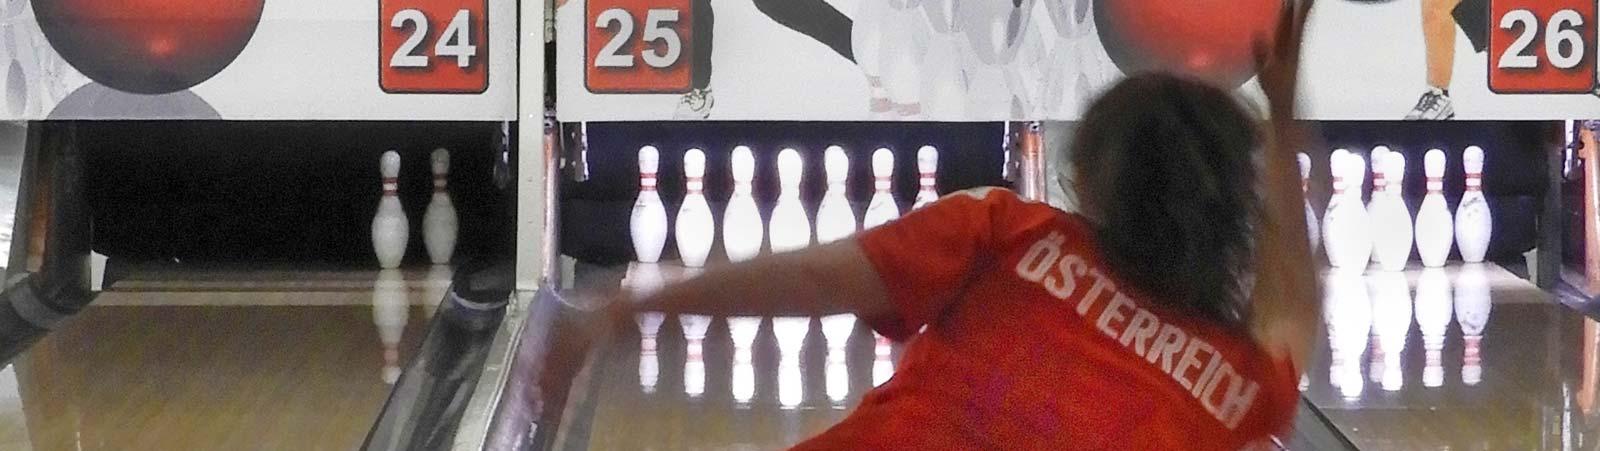 Bowlingverband